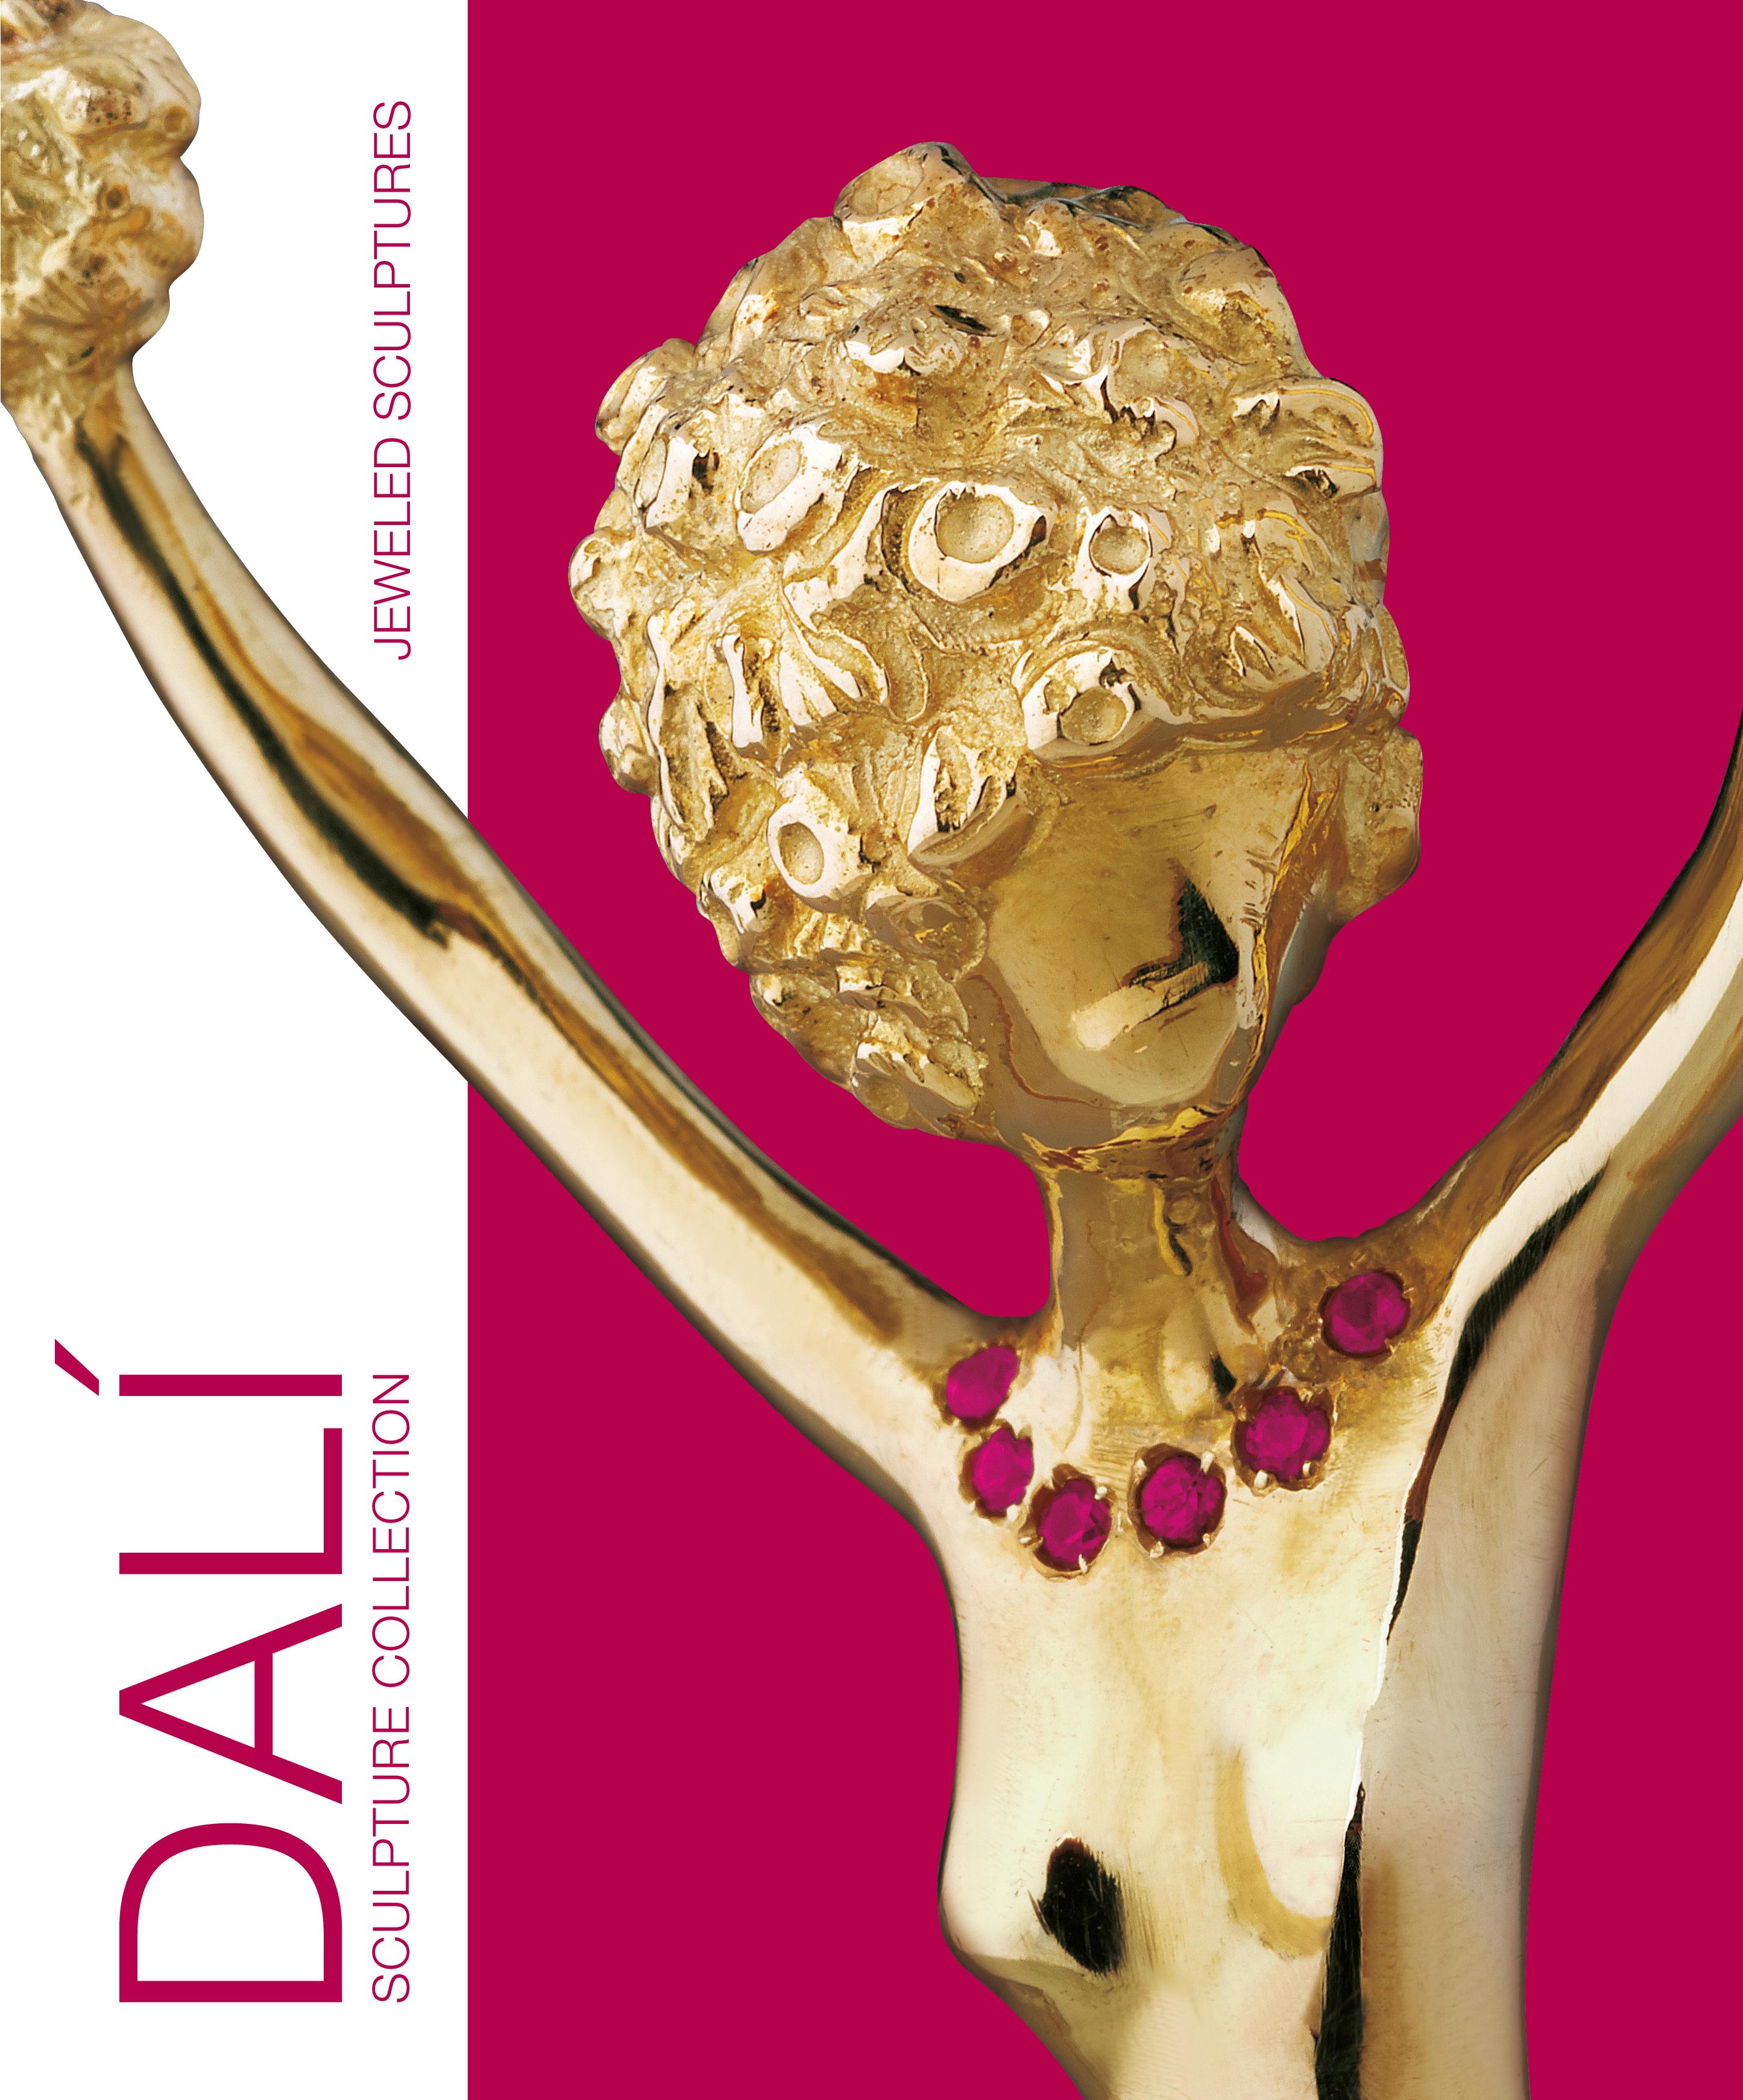 Dalí Sculpture Collection Jeweled Sculptures